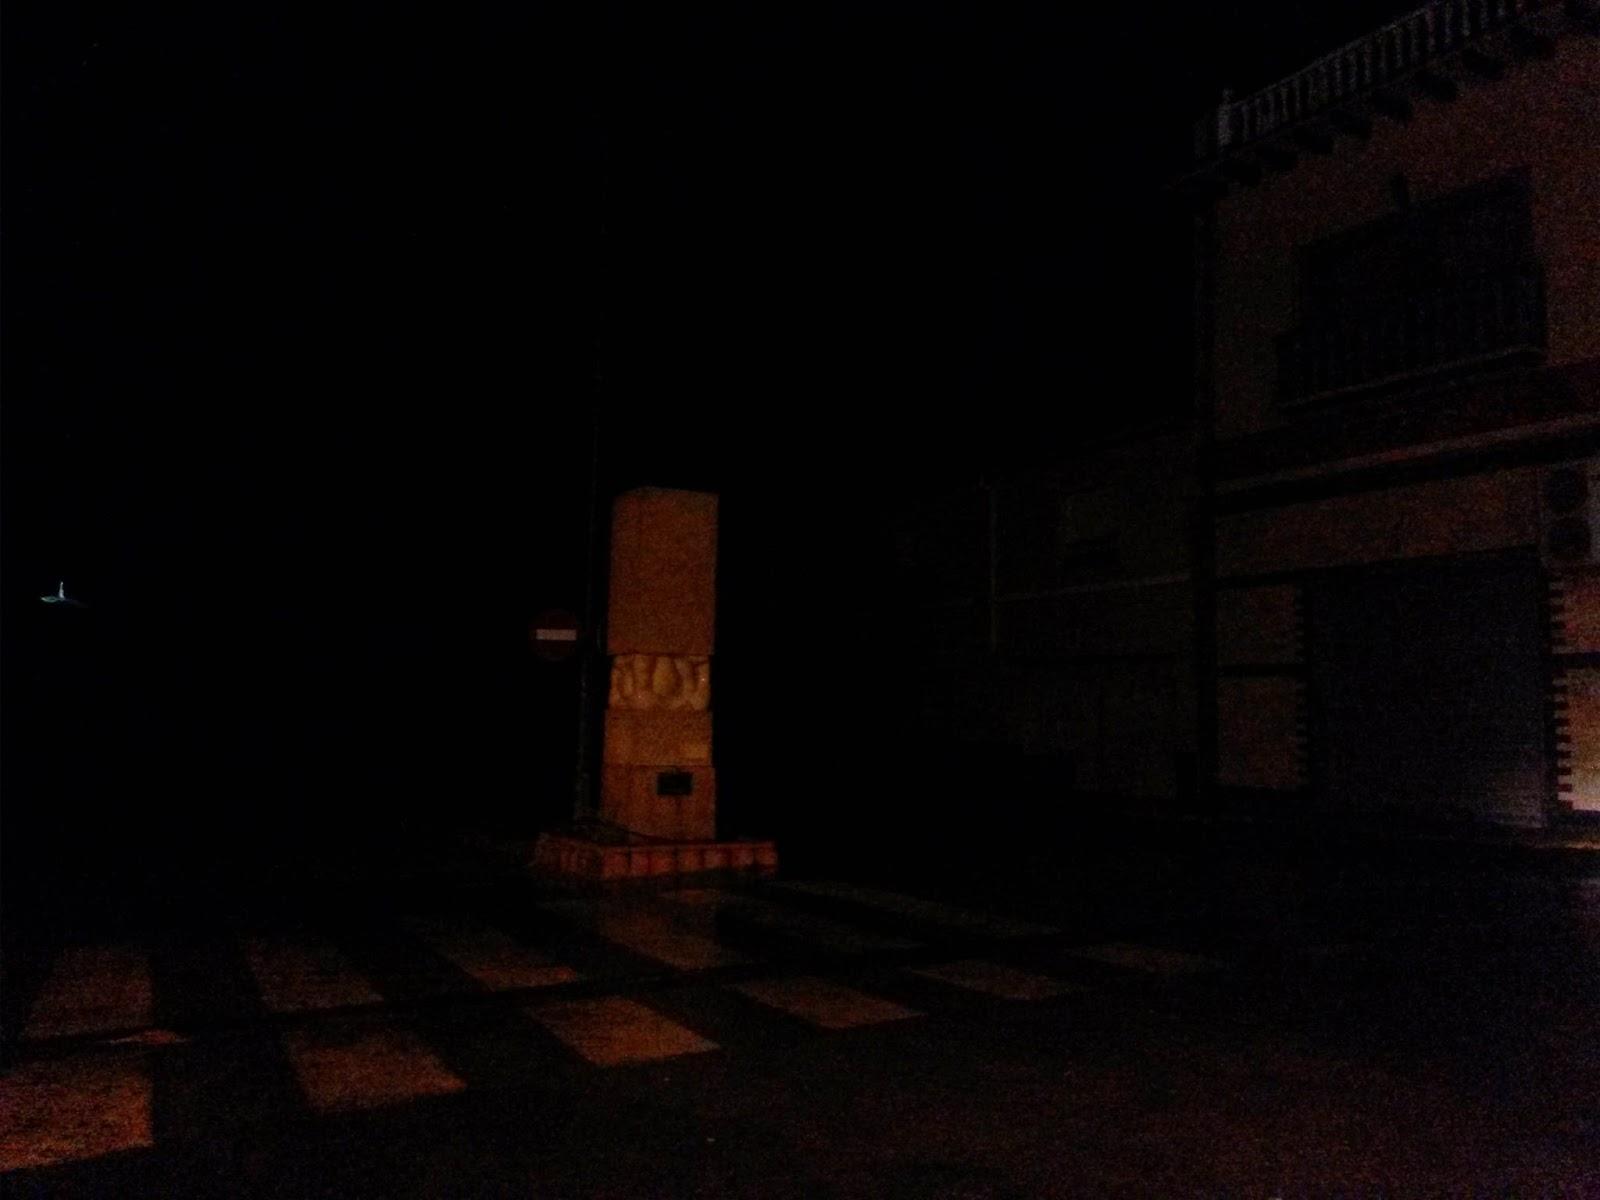 29-09-2014 Avenida Roca de Togores